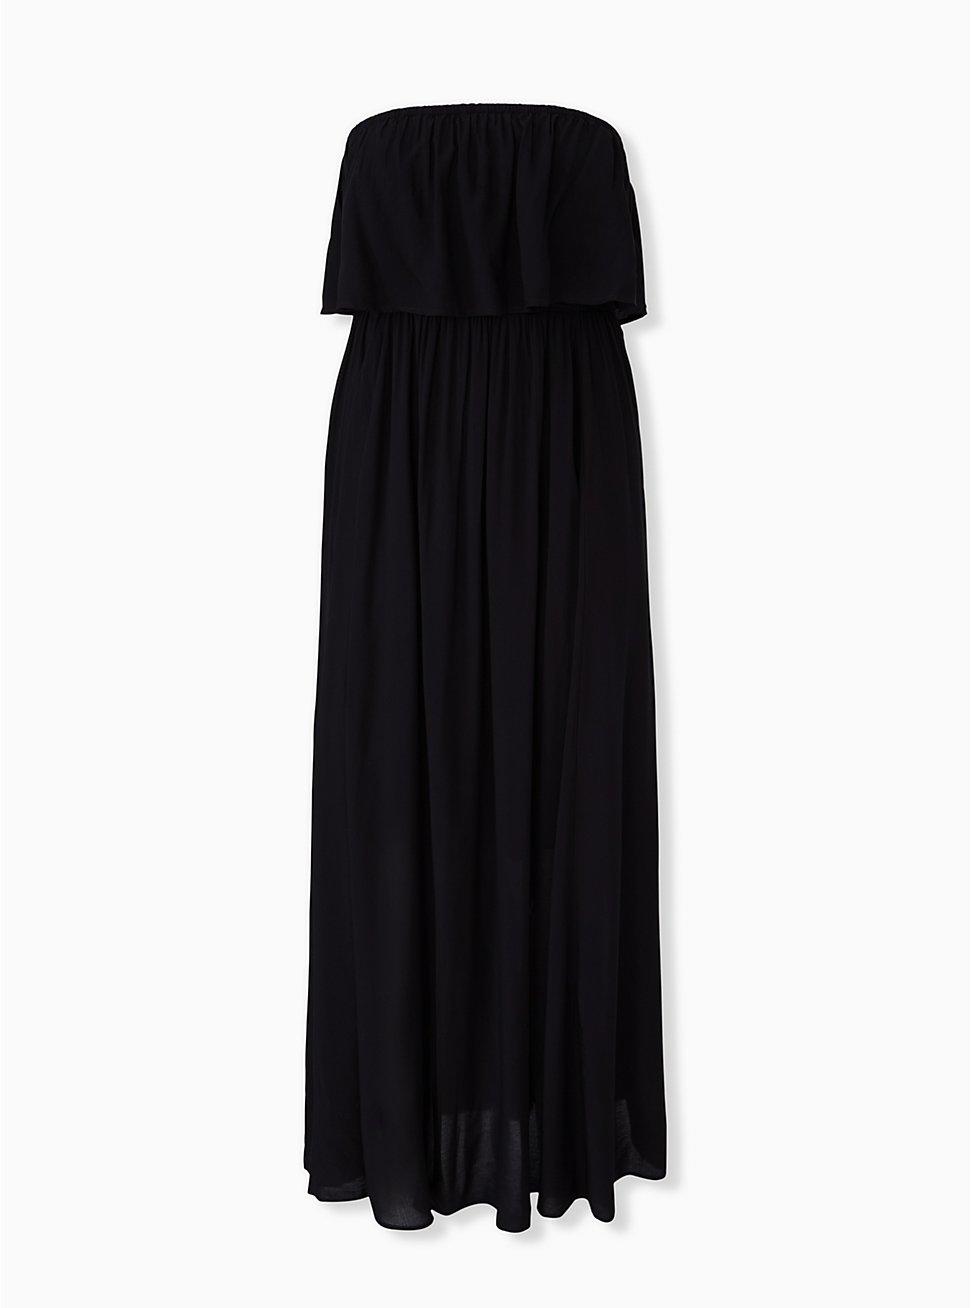 Plus Size Black Challis Strapless Maxi Dress, DEEP BLACK, hi-res